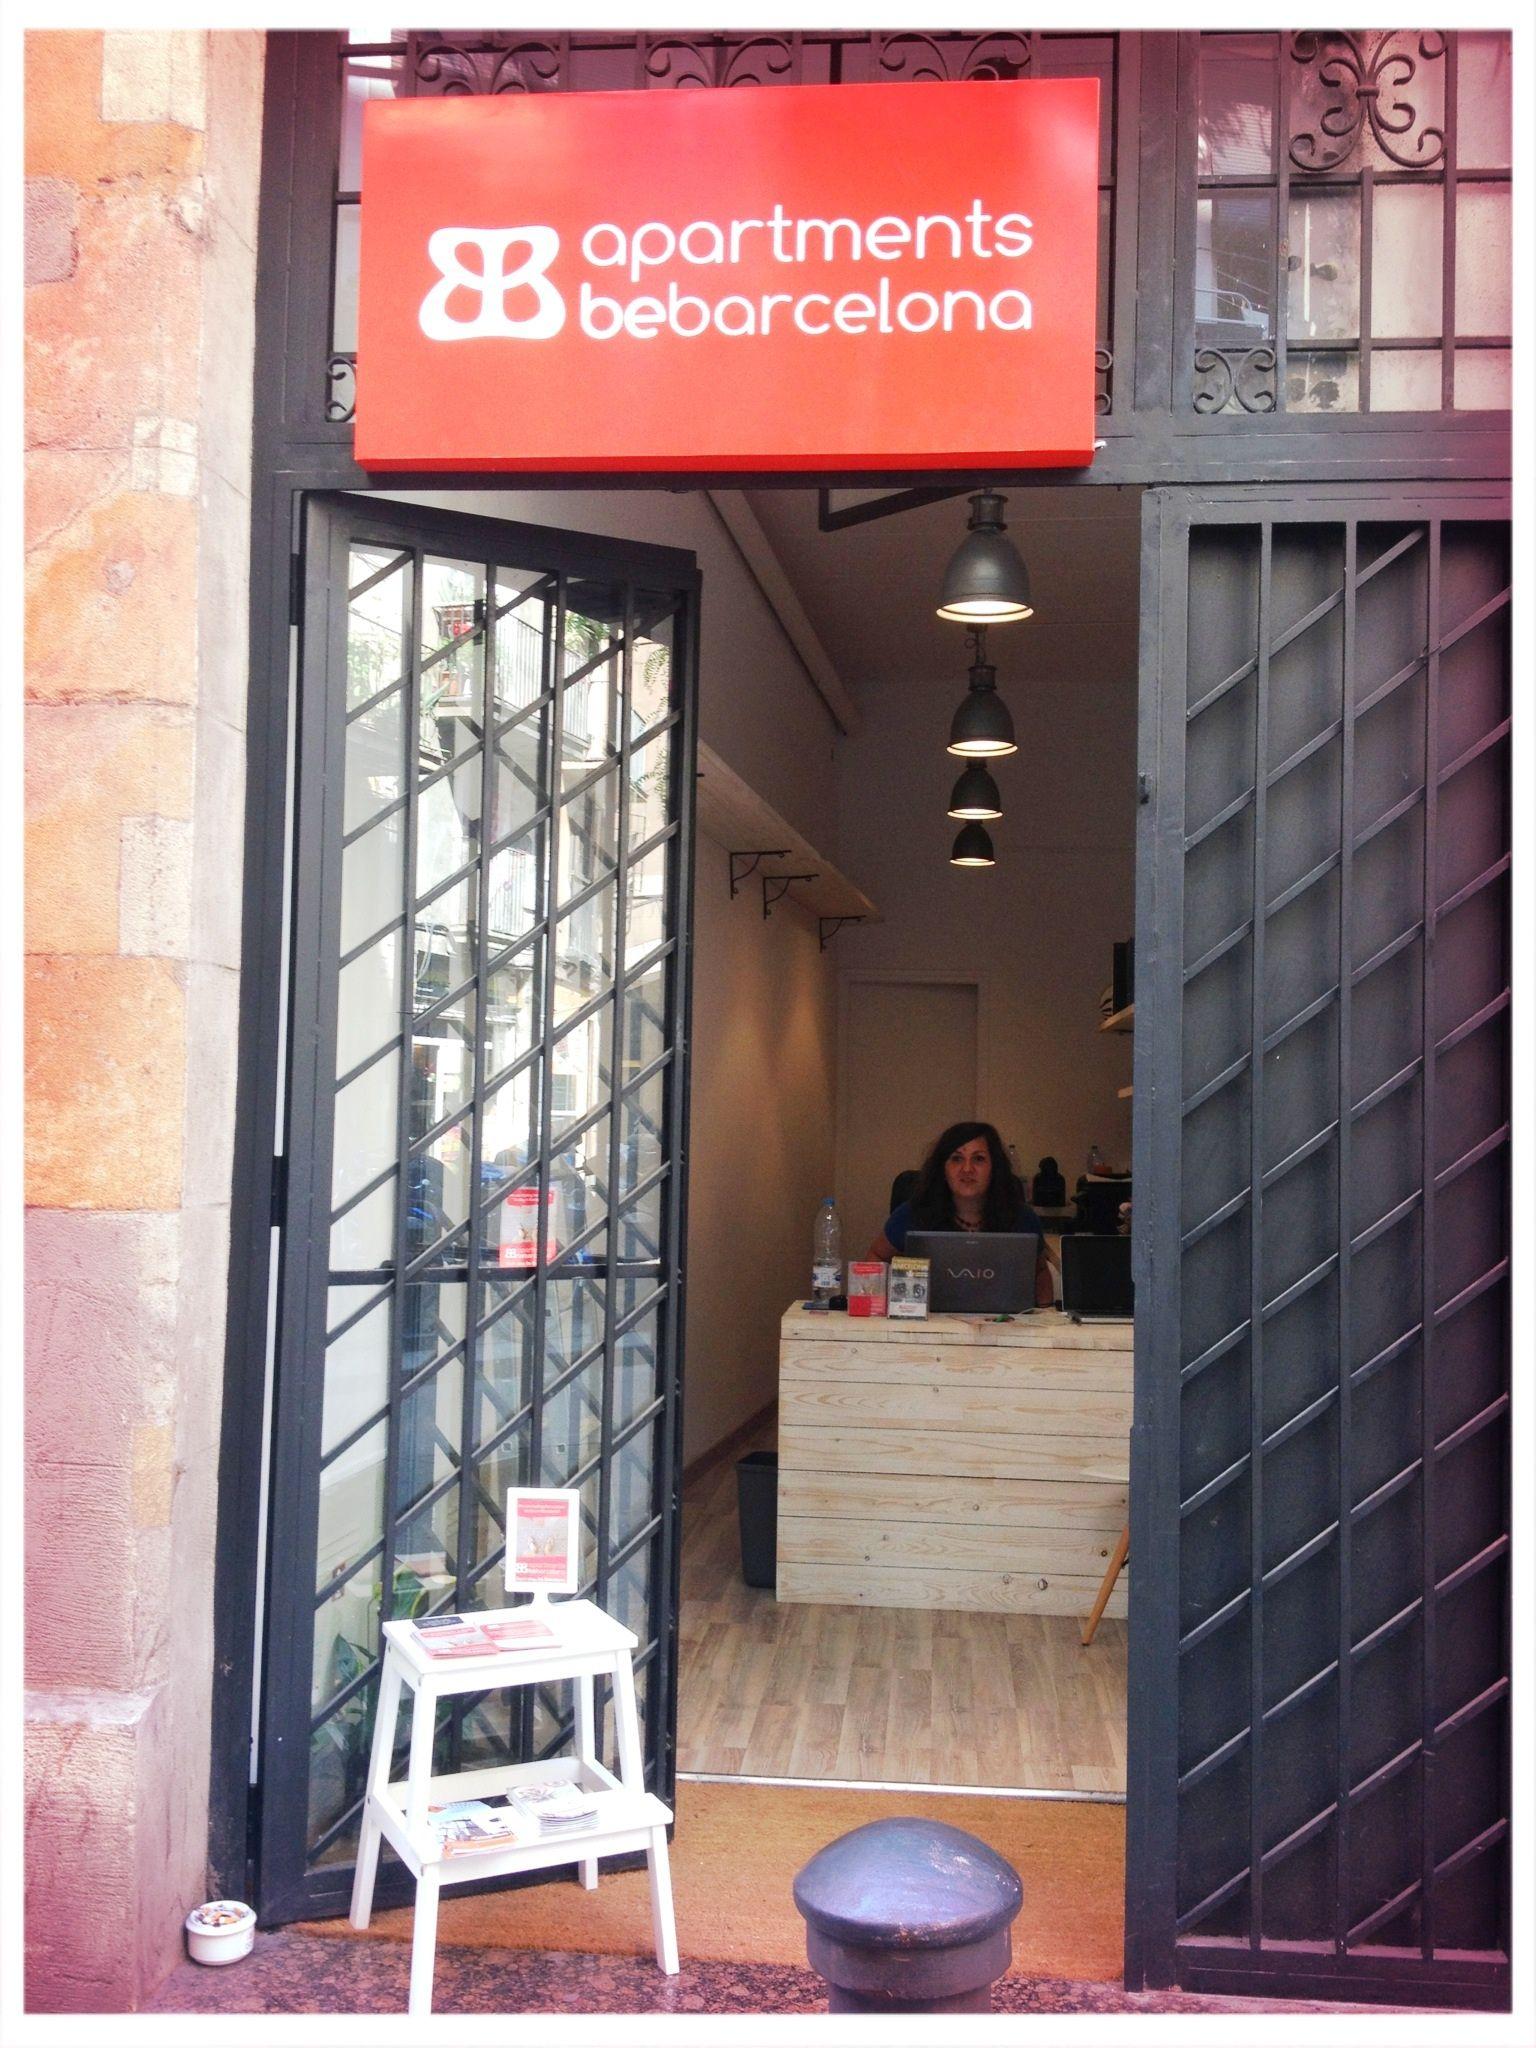 OUR OFFICE IN PLAZA DE LA LLANA, 8